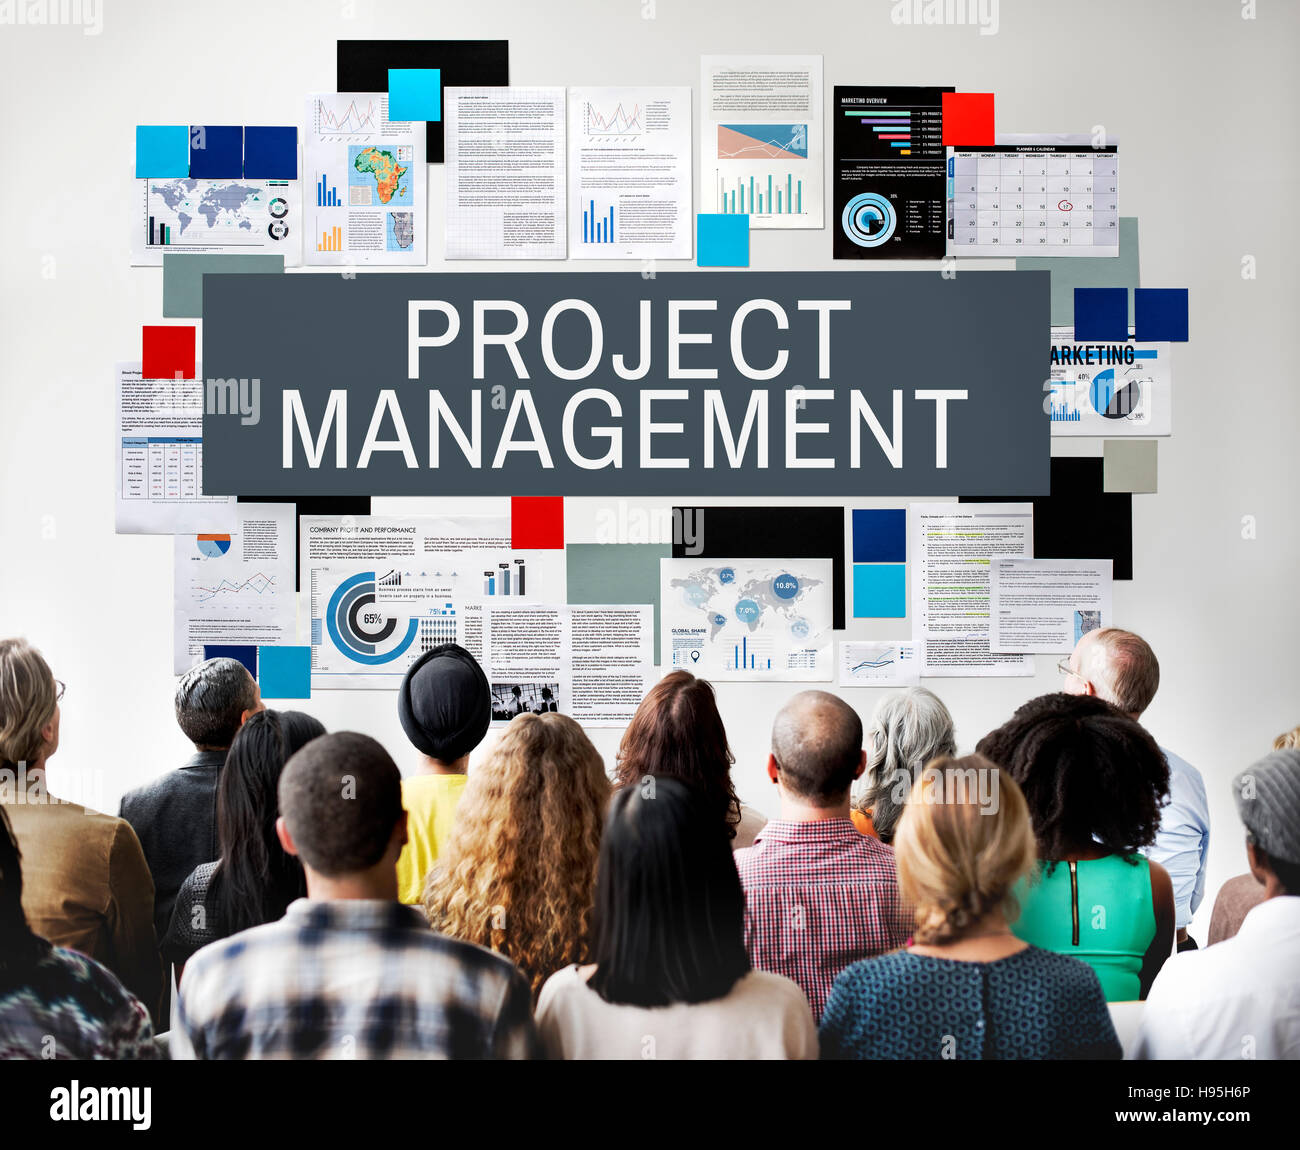 Project Management Methods Processes Concept - Stock Image